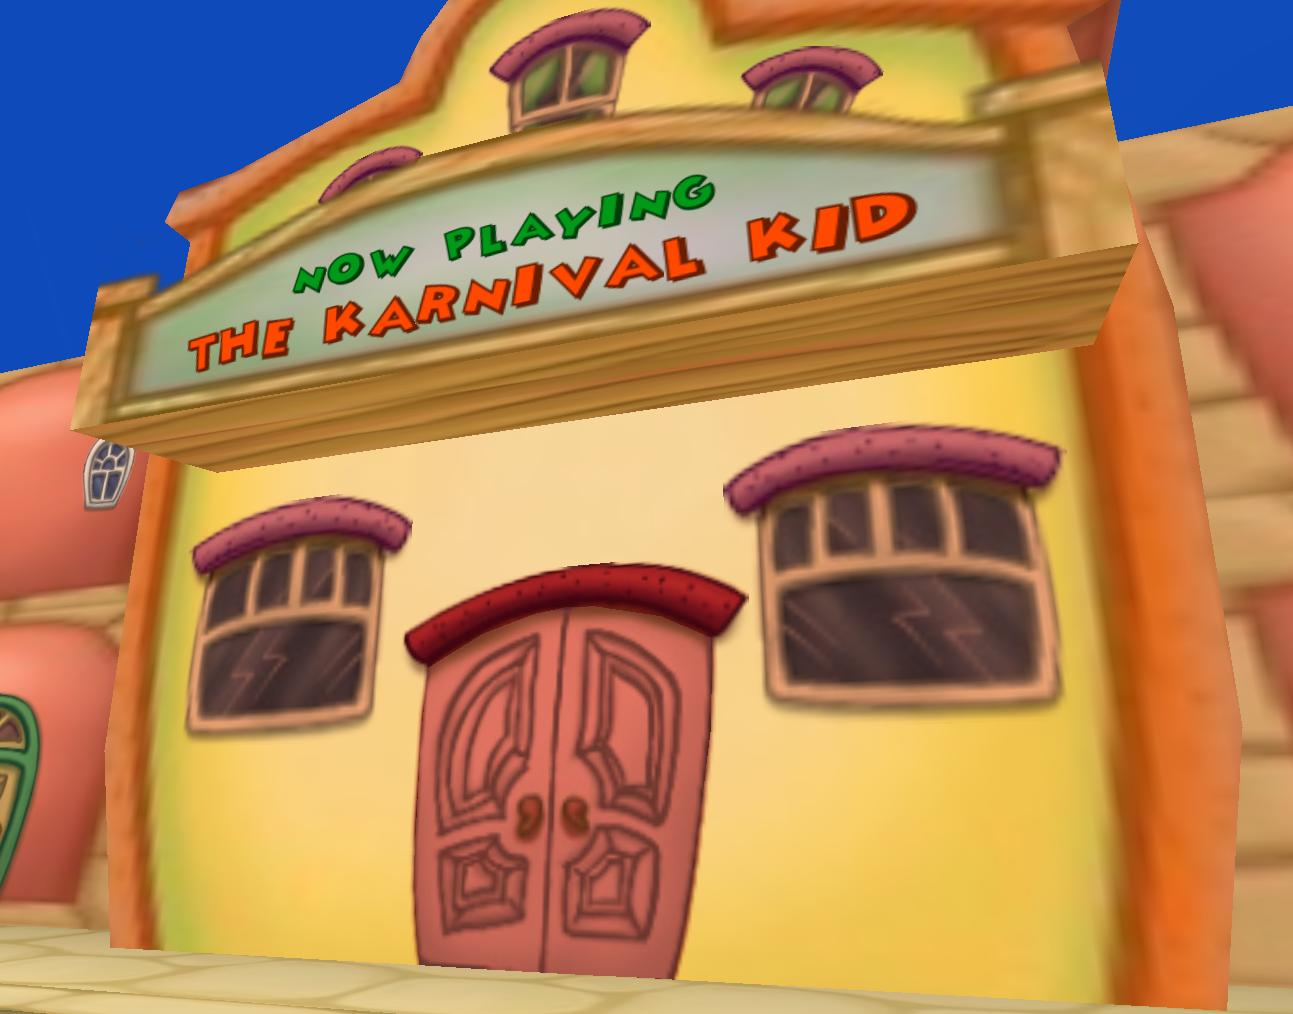 File:The Karnival Kid.png